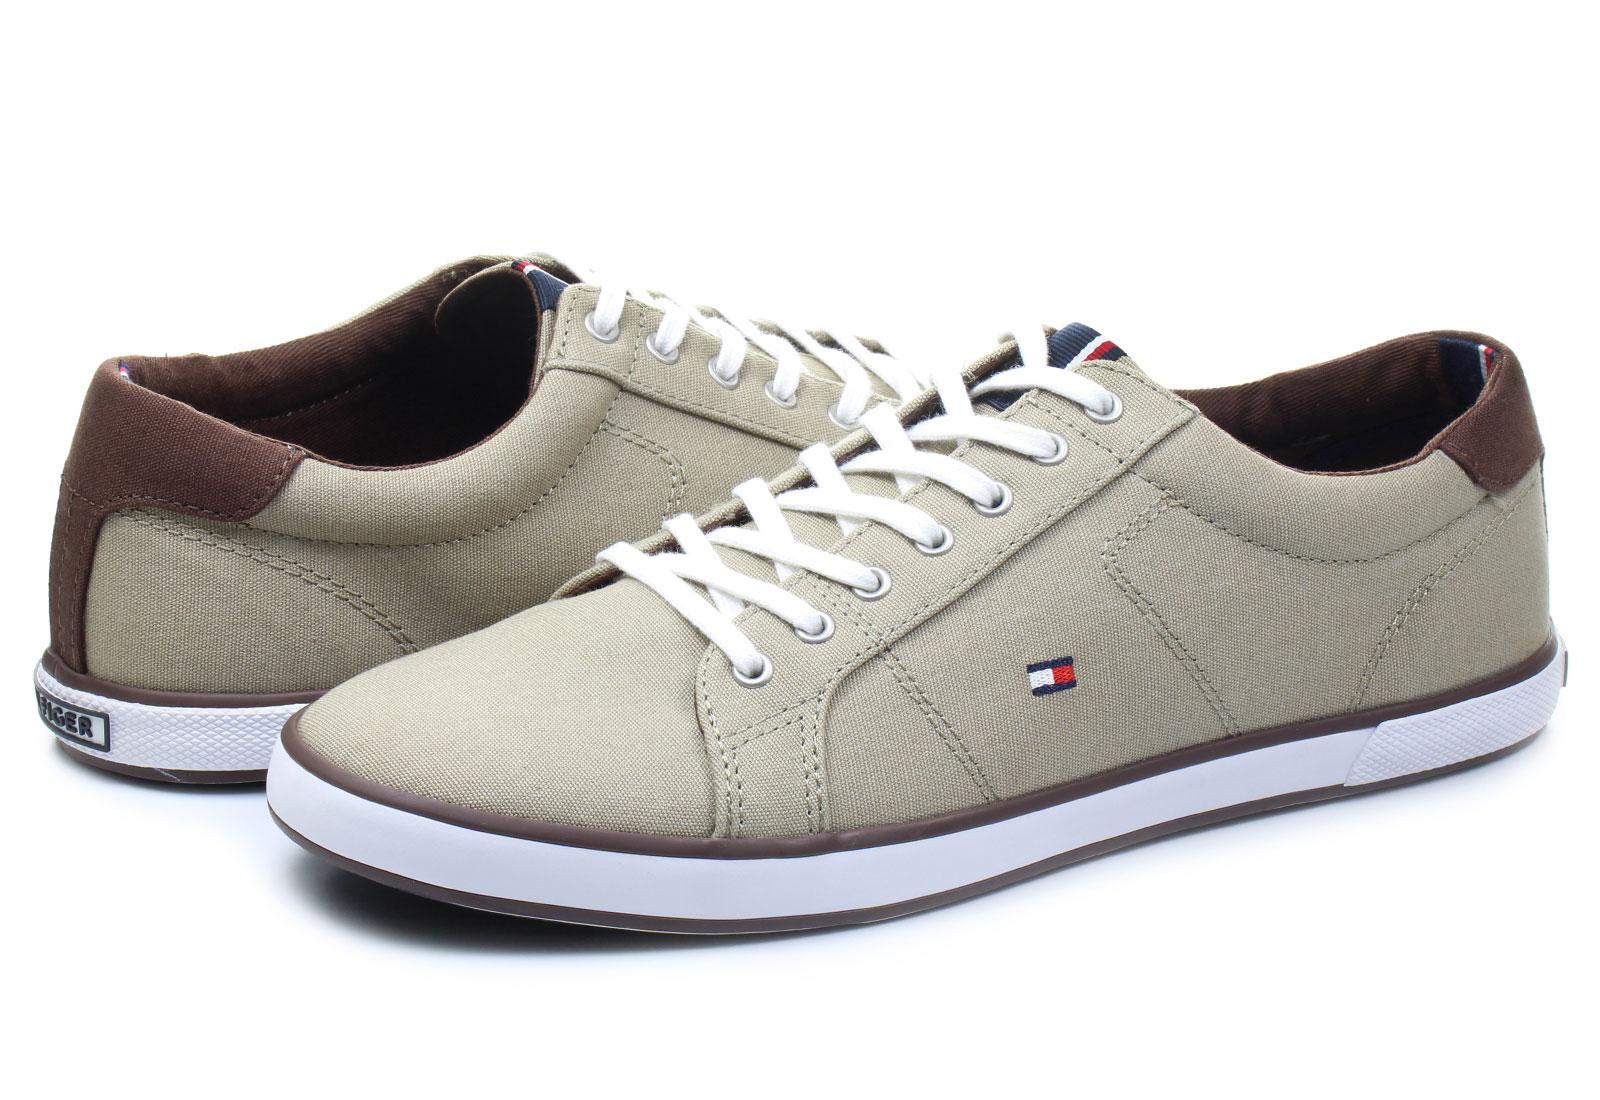 6c078788572fa Tommy Hilfiger Shoes - Harlow 1d - 16S-0892-068 - Online shop for ...